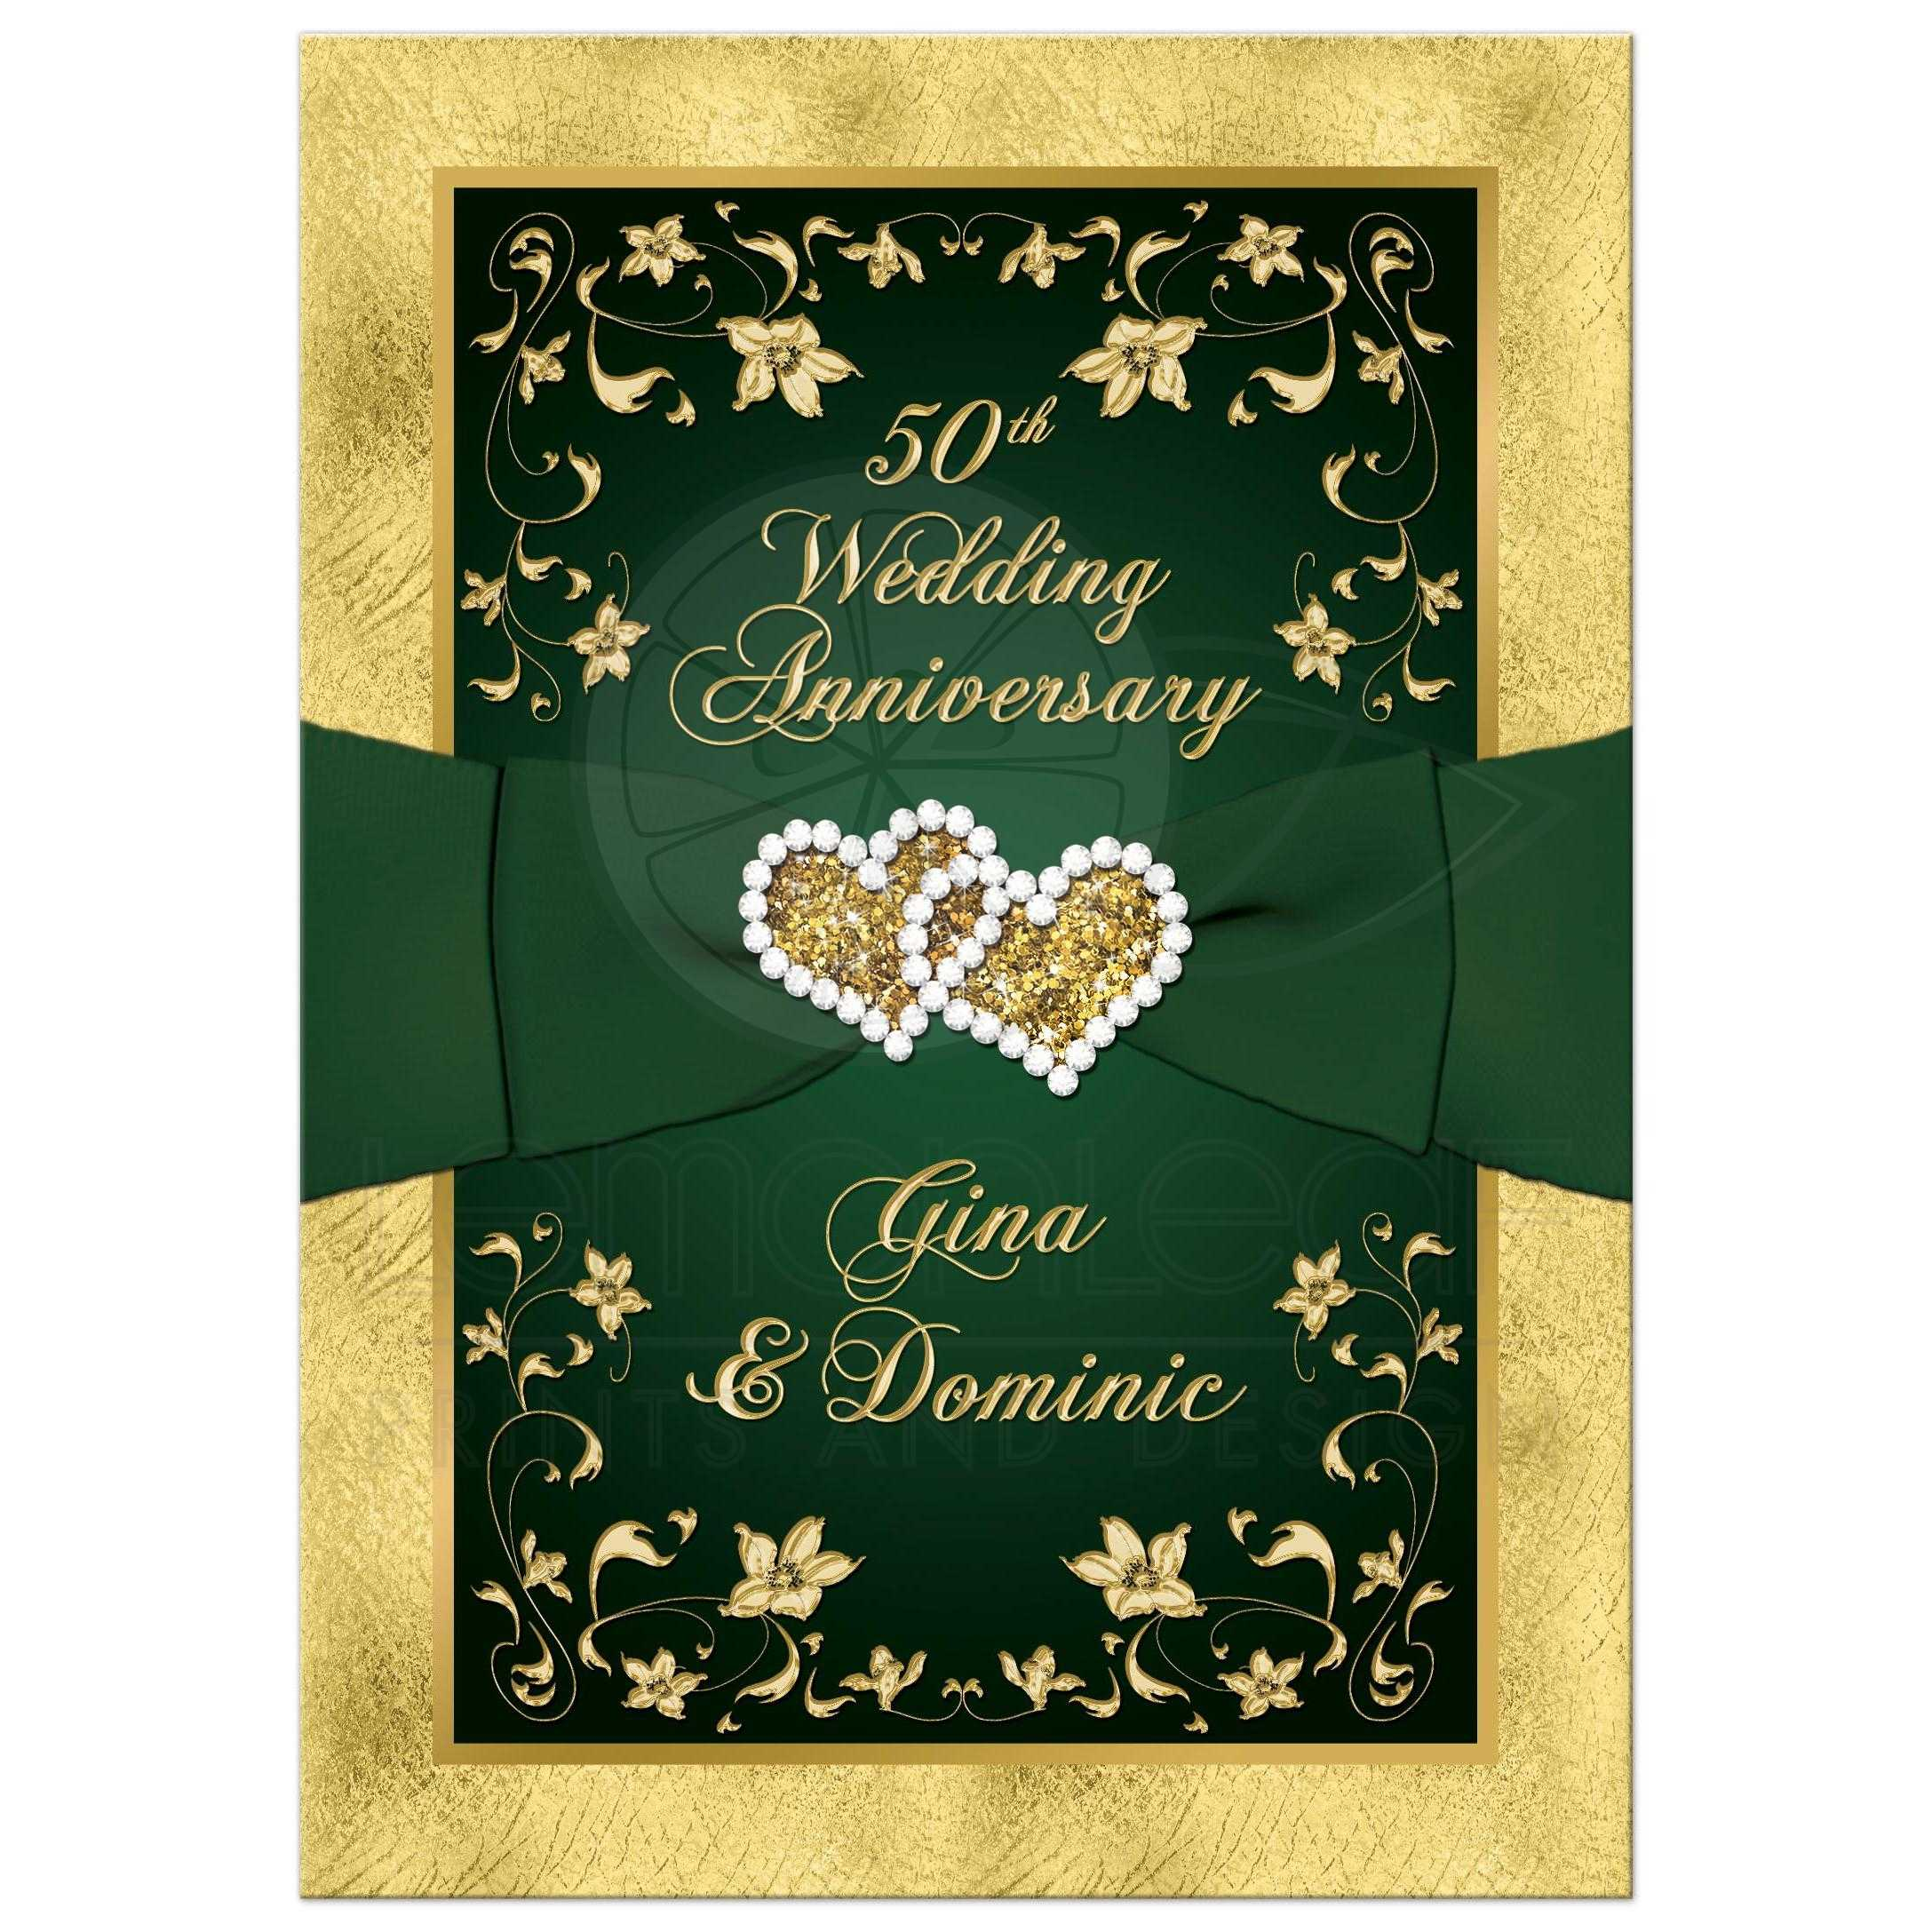 50th Wedding Anniversary Invitation | Green, Gold Floral | PRINTED ...